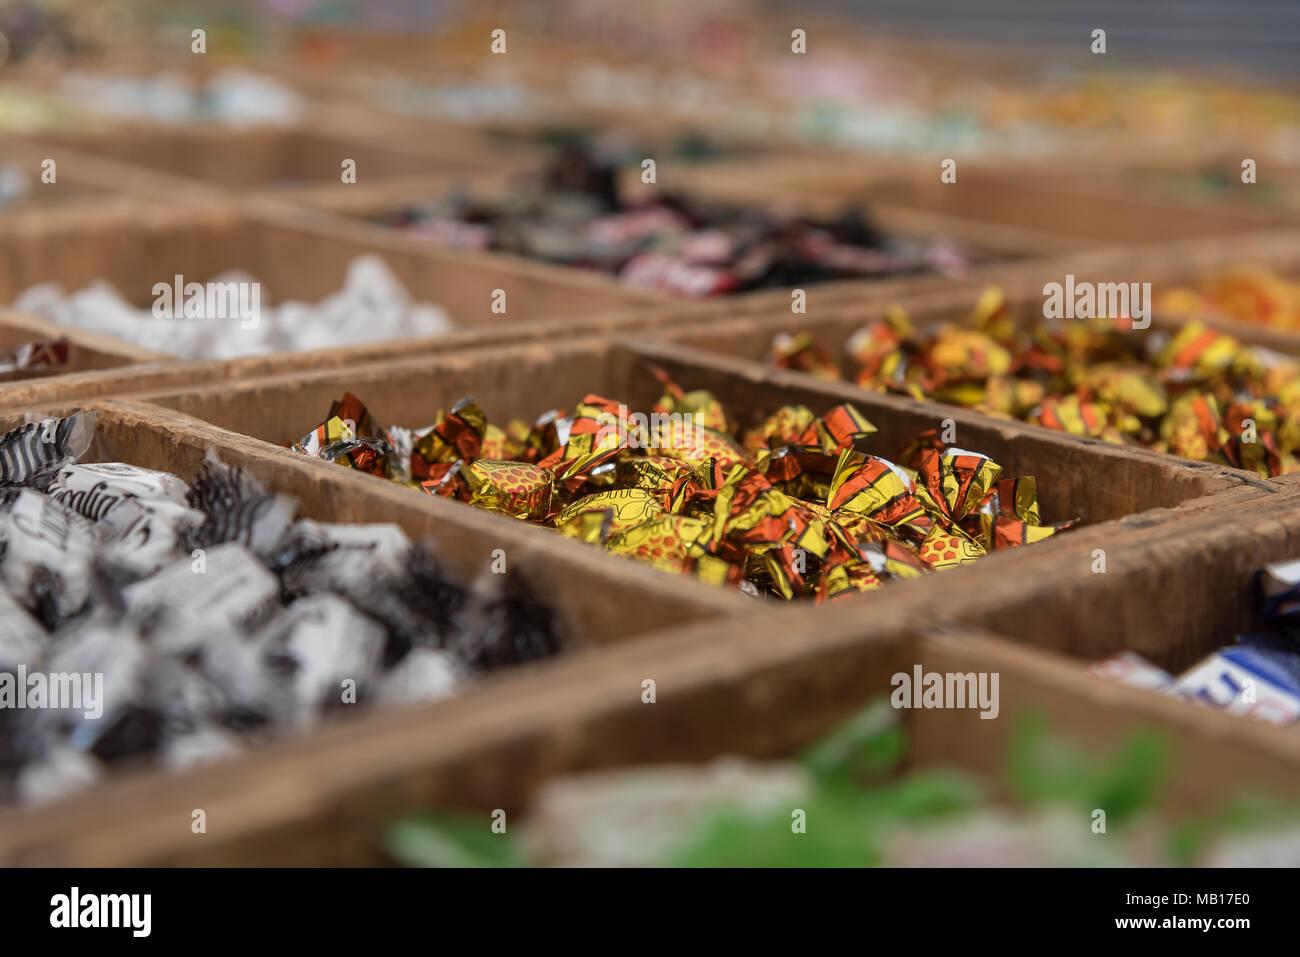 Leckere Bonbons in Holzkisten mit dem Markt von Palma de Mallorca Stockbild